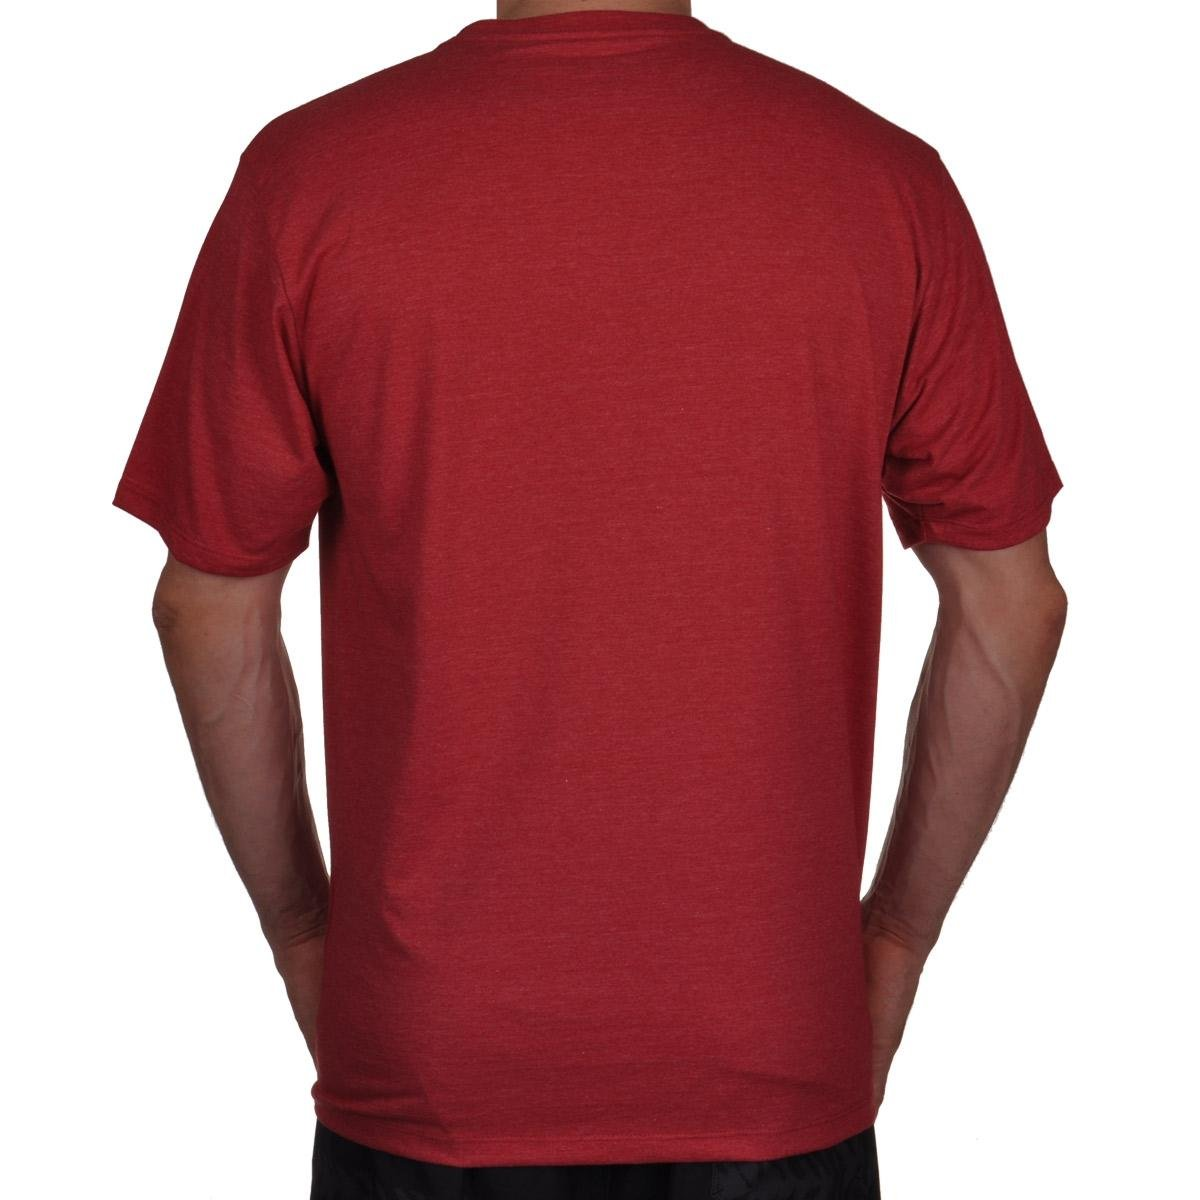 Camiseta Vermelho Masculino amp;O Silk Silk O O Vermelho Hurley Masculino Camiseta amp;O Hurley RrRZTq